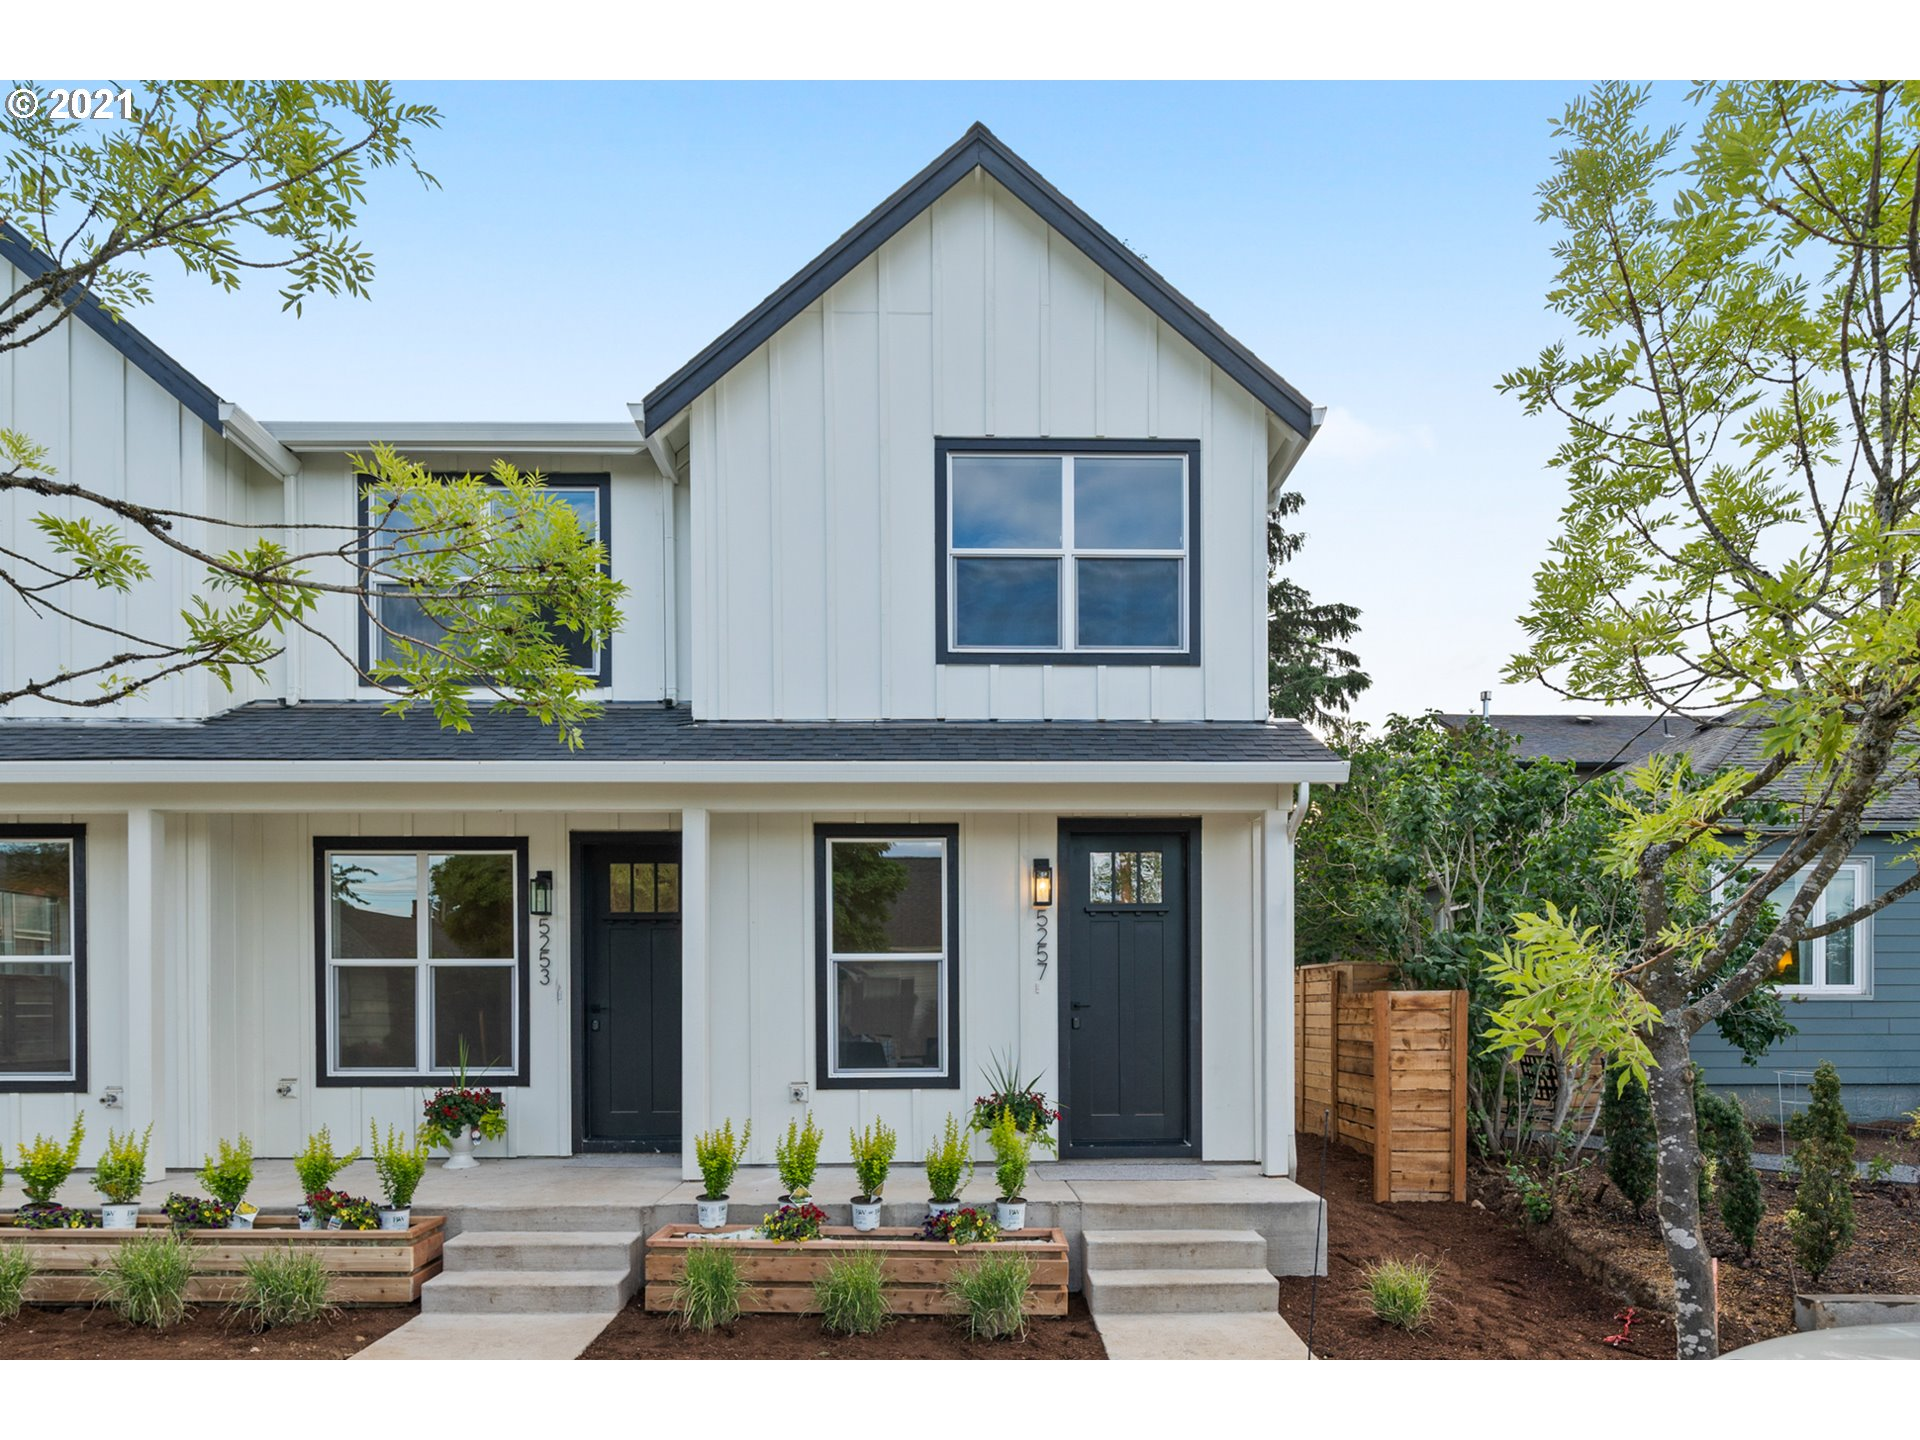 5251 NE 32nd PL, Portland OR 97211